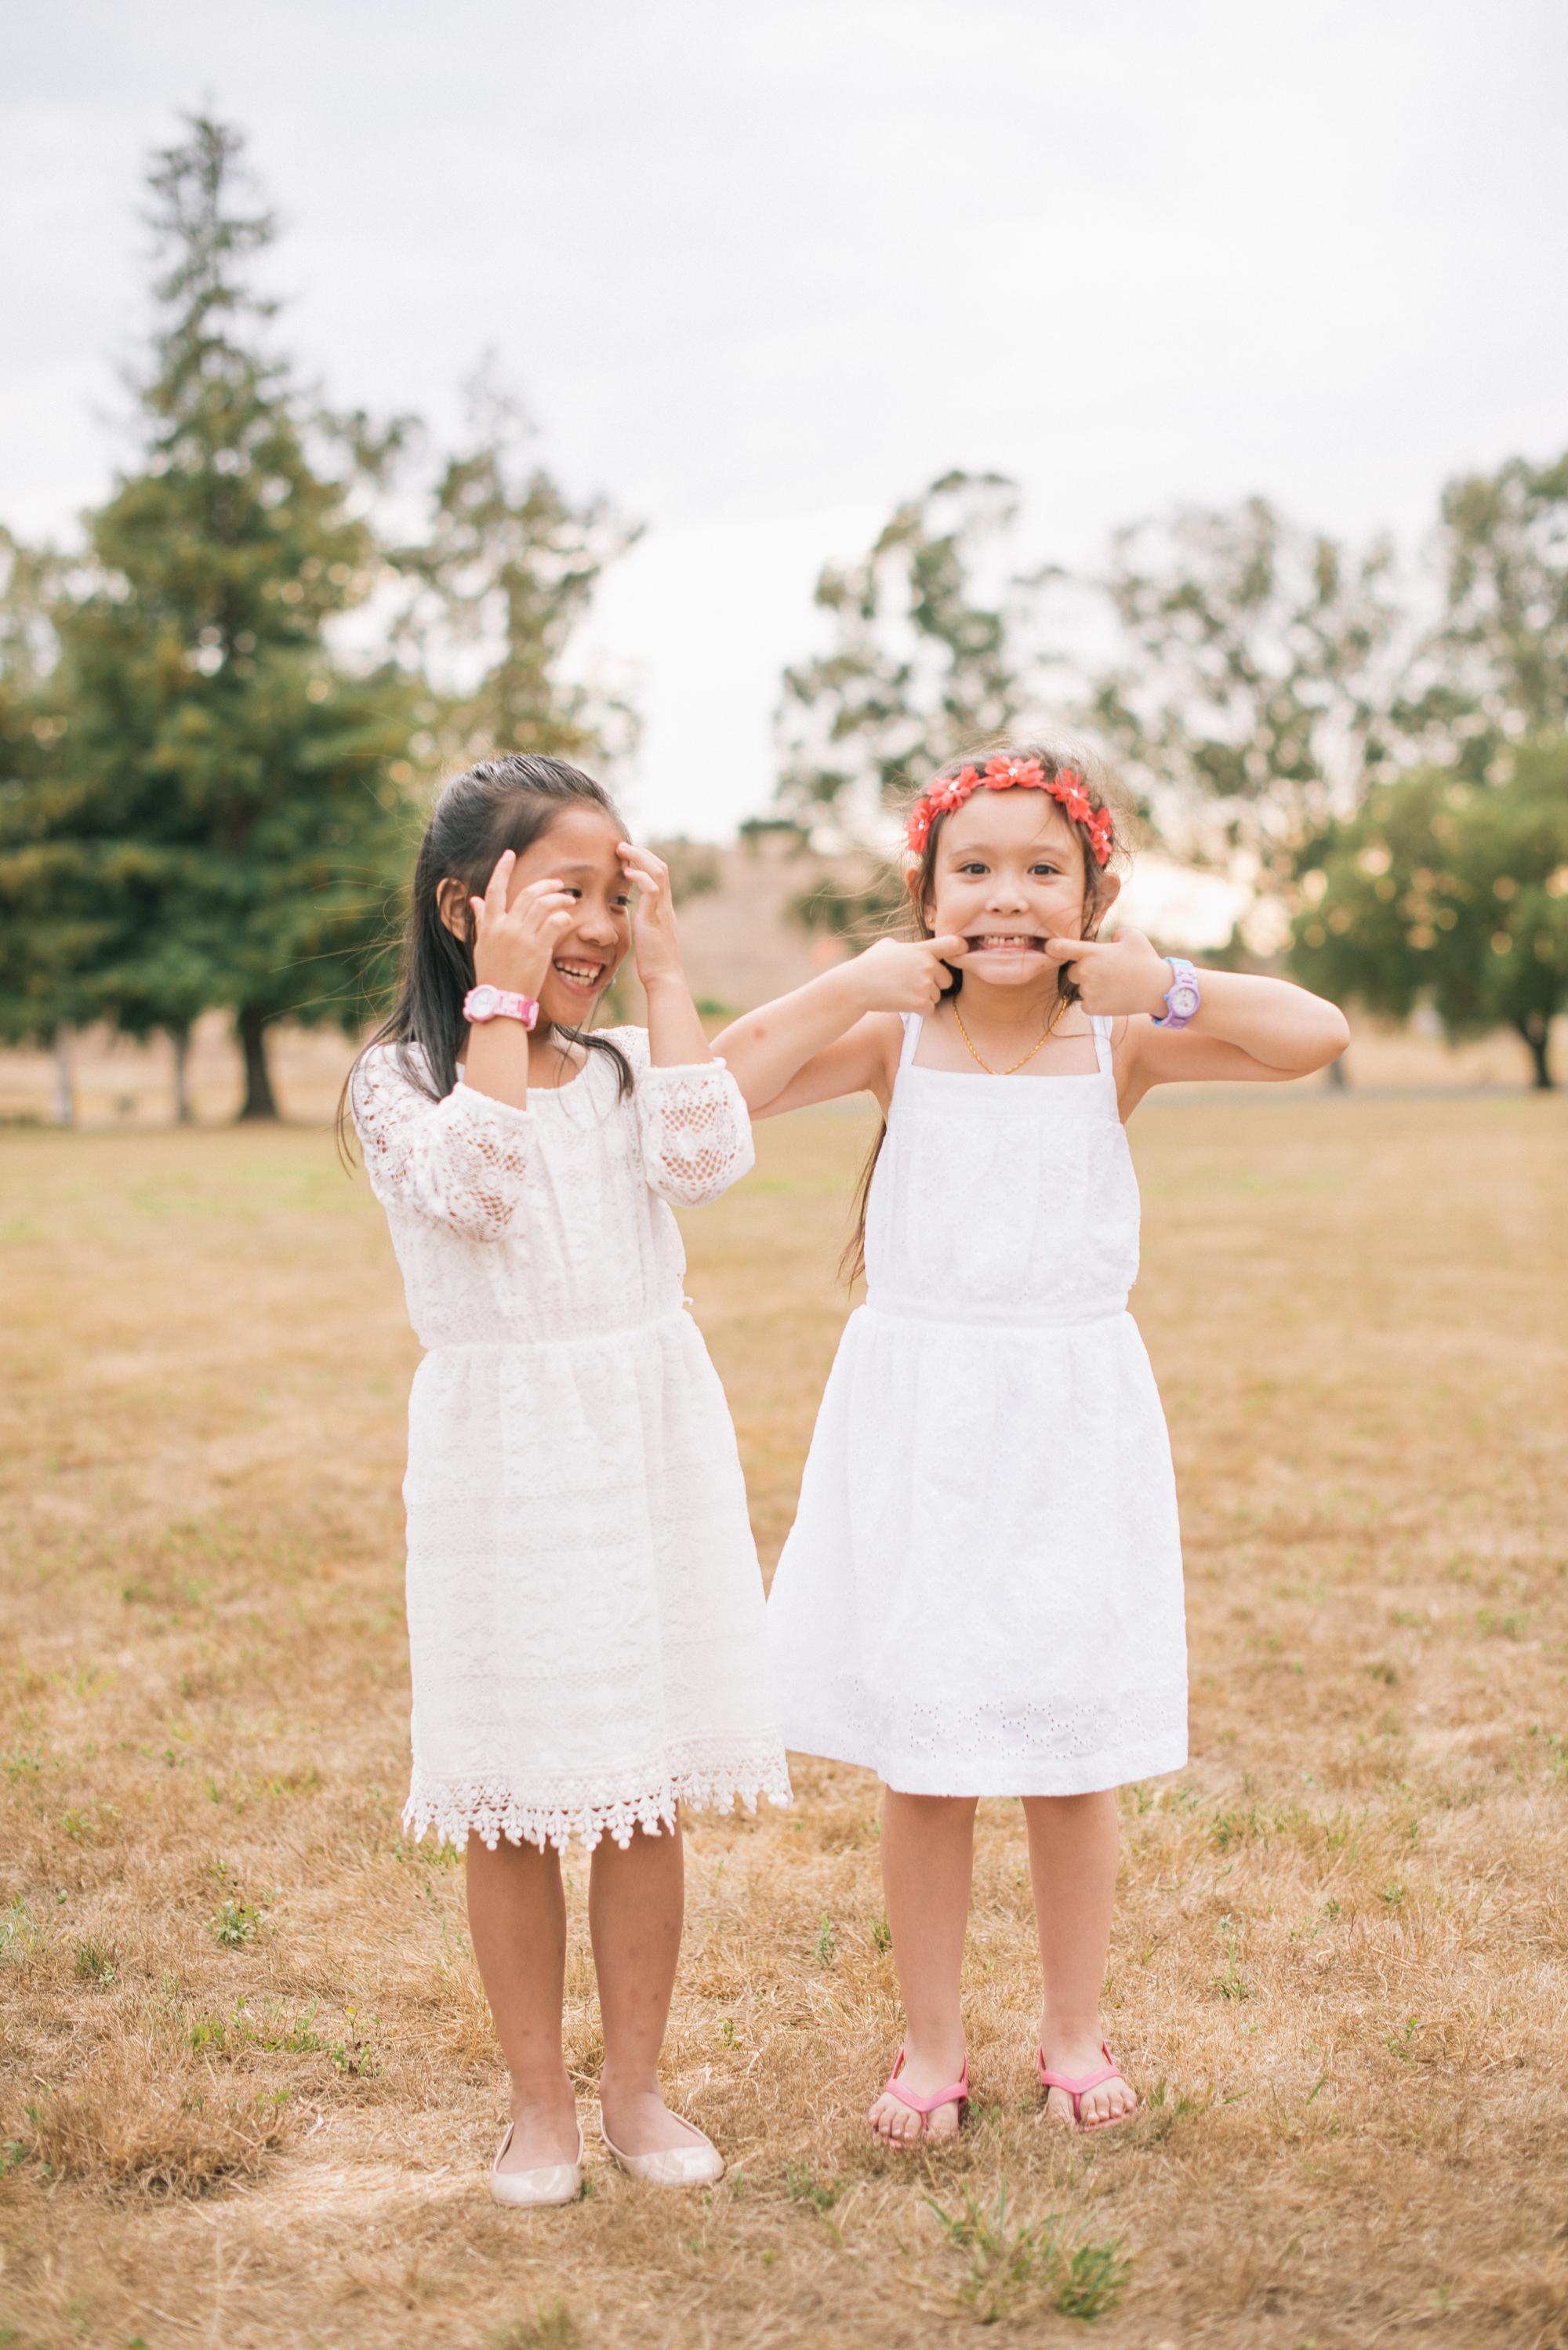 melissademata.com | Family Photography